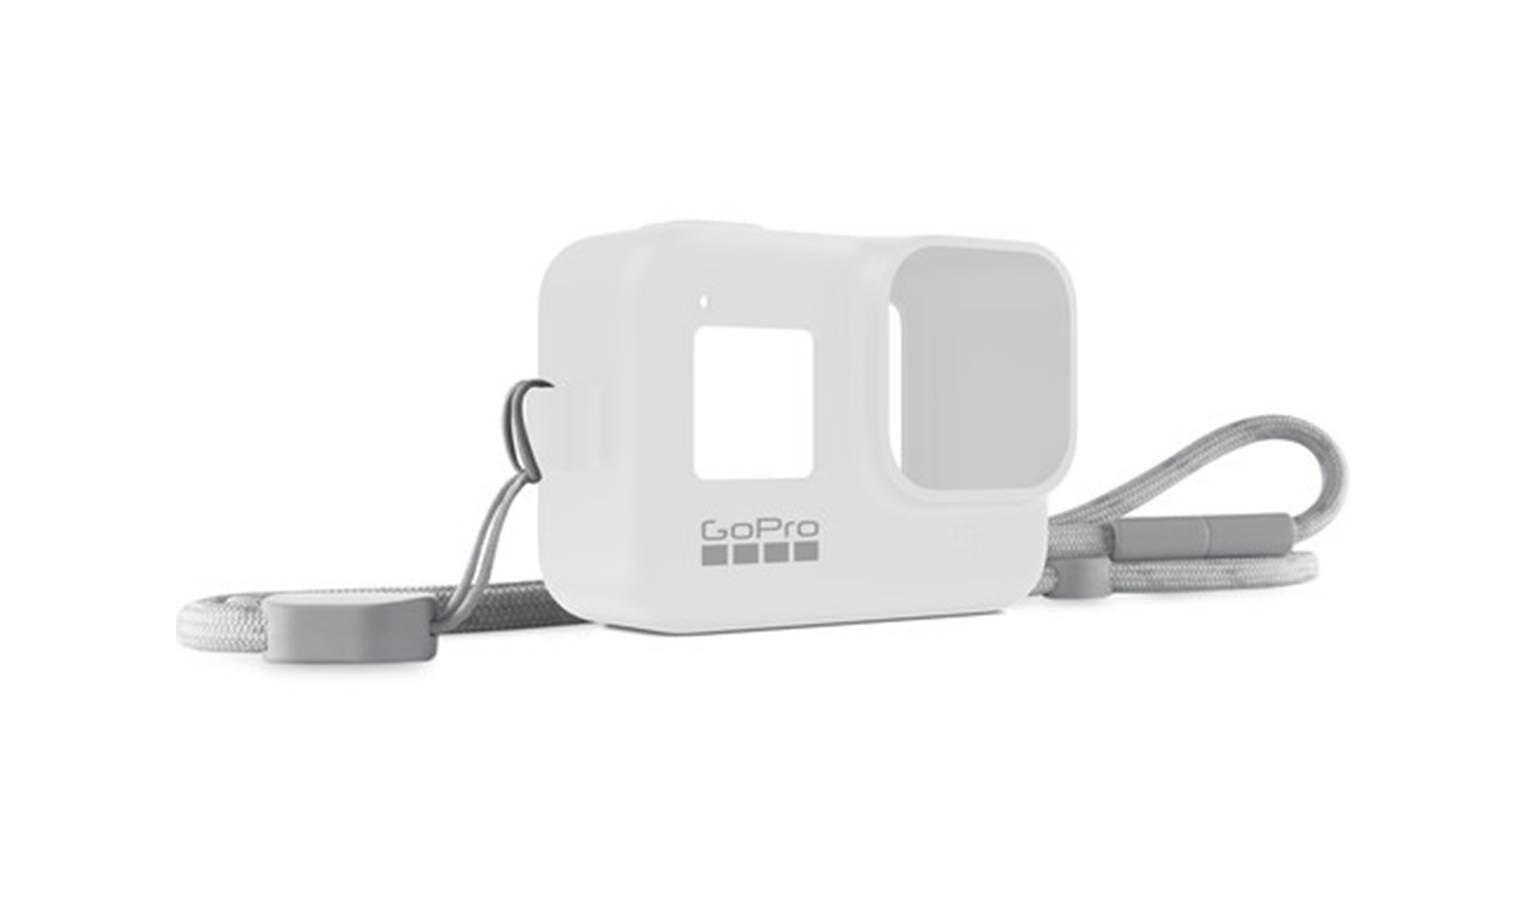 GoPro Silicone Sleeve and Adjustable Lanyard Kit for GoPro HERO8 BLACKOUT / WHITE HOT / BLUEBIRD / HYPER ORANGE / TURTLE GREEN